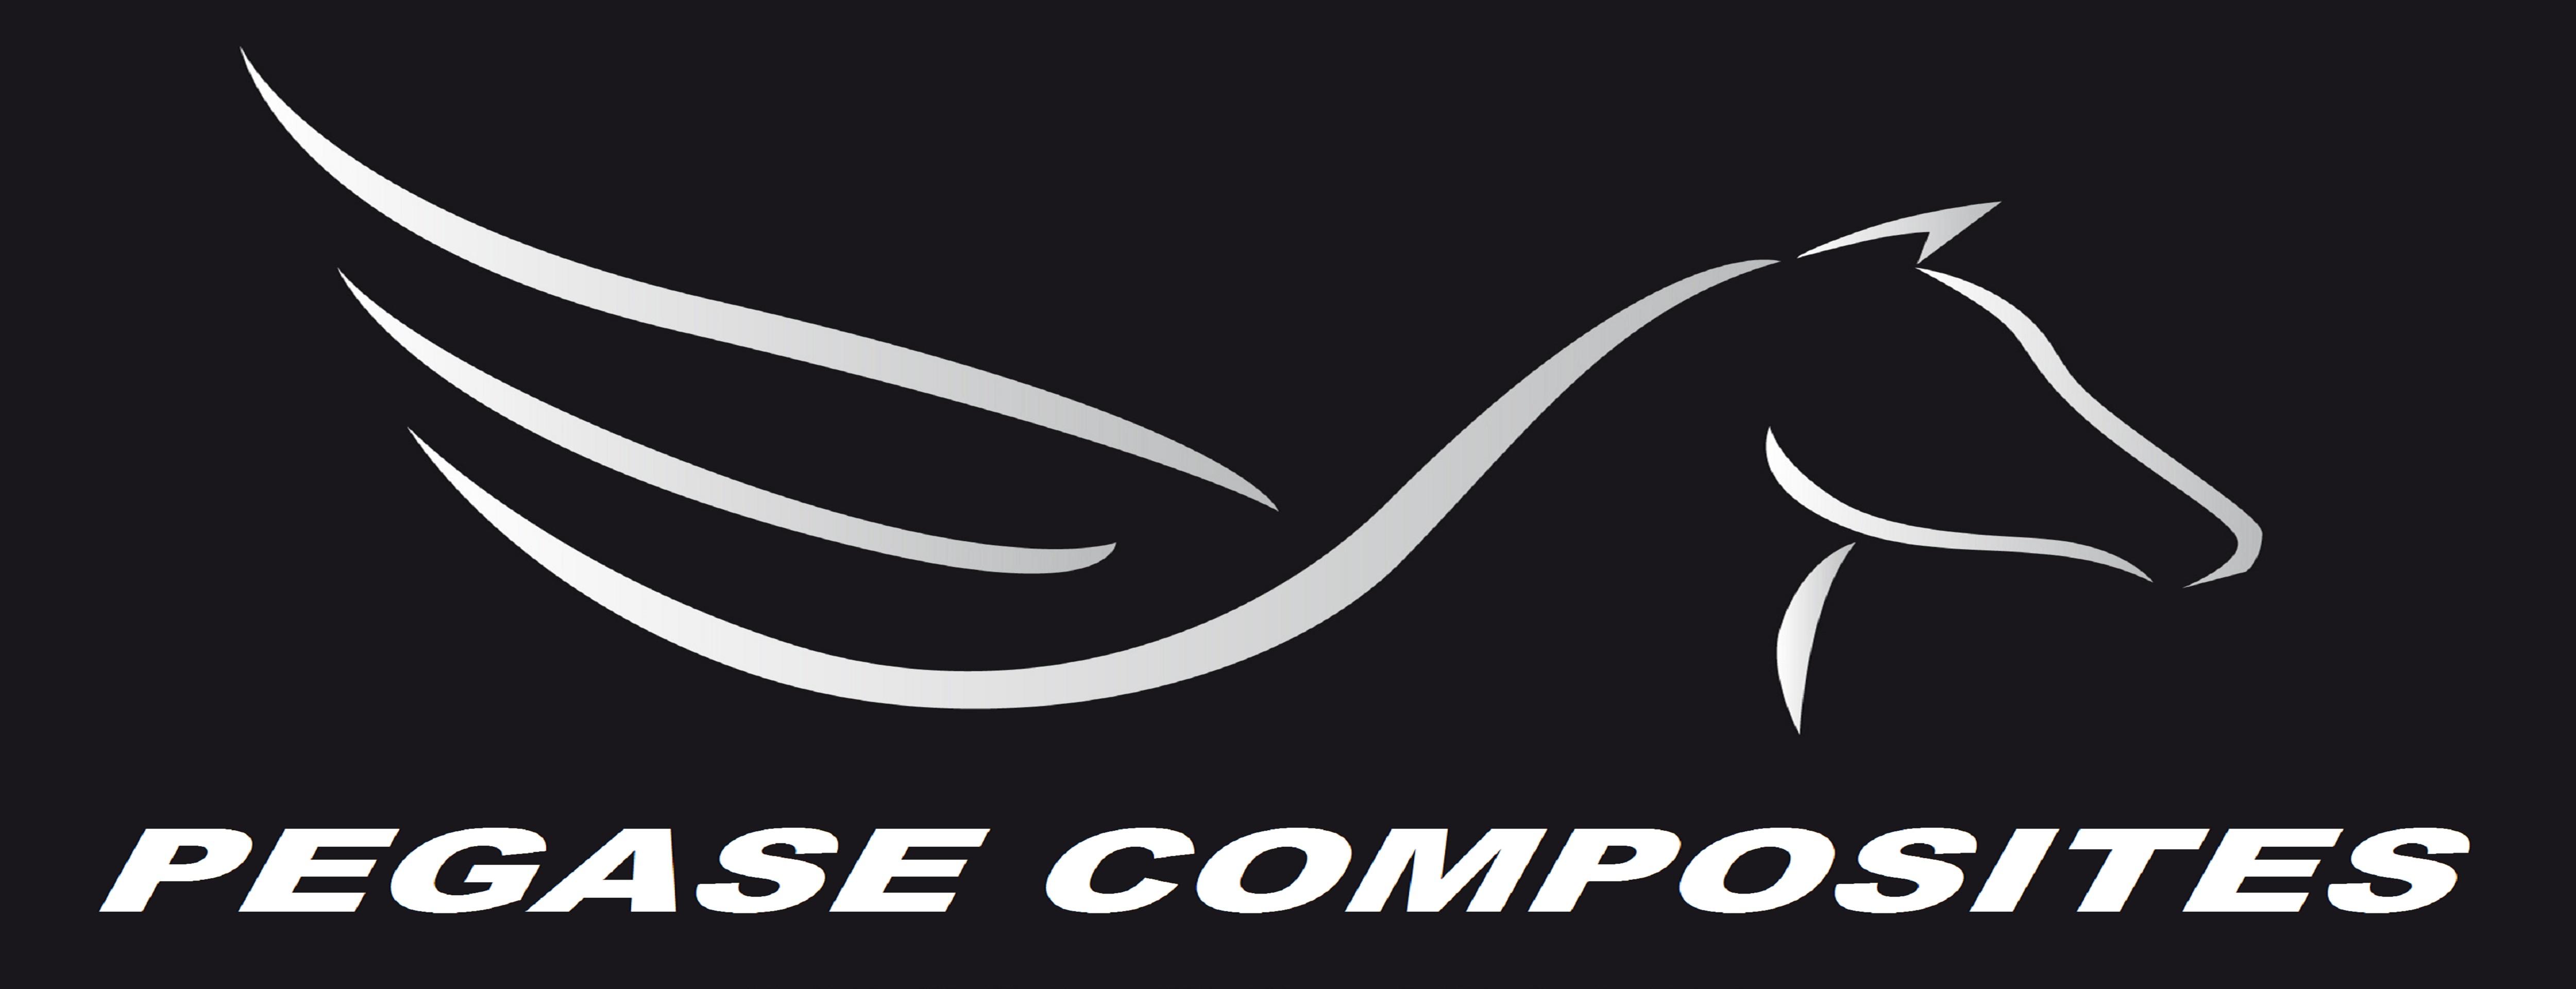 logo entreprise, logo pegase